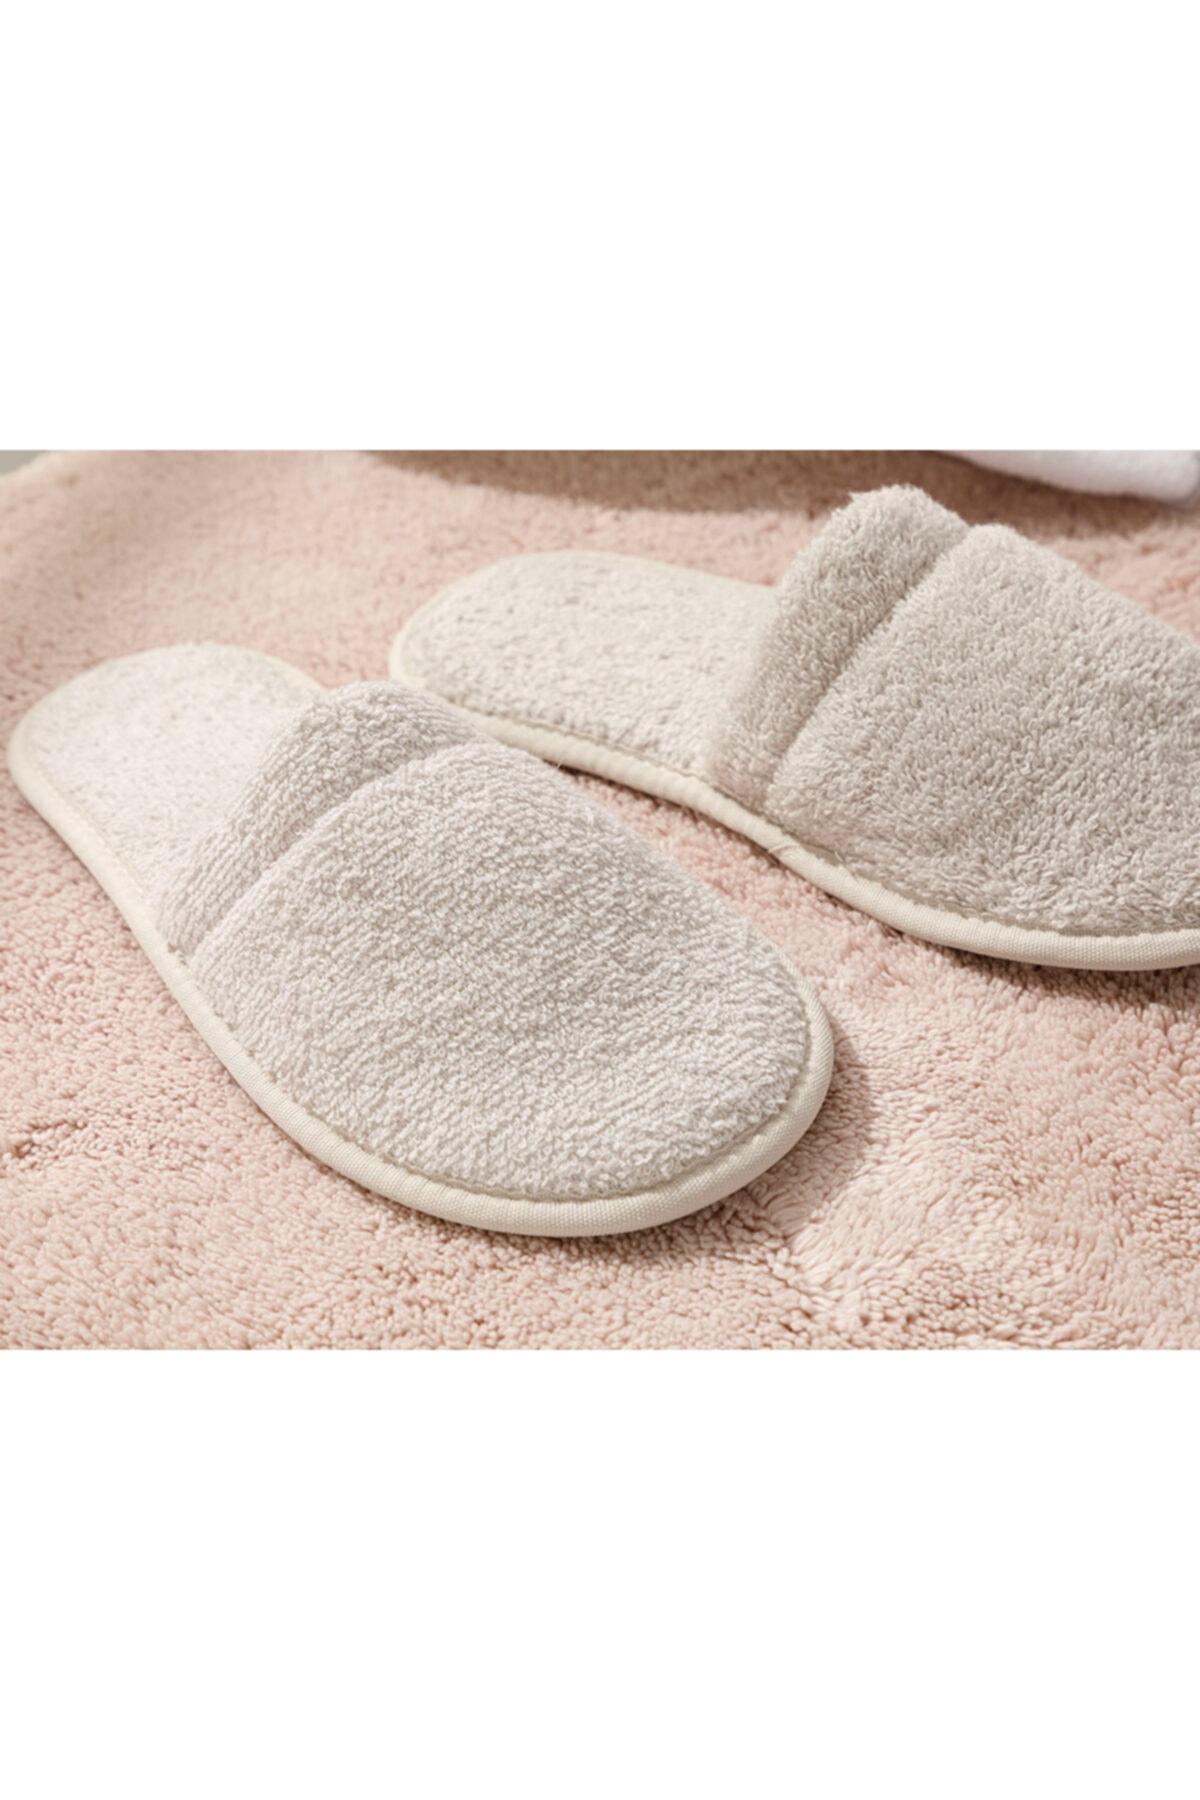 English Home Simple Pamuklu Kadın Banyo Terliği 36-40 Açık Bej 2